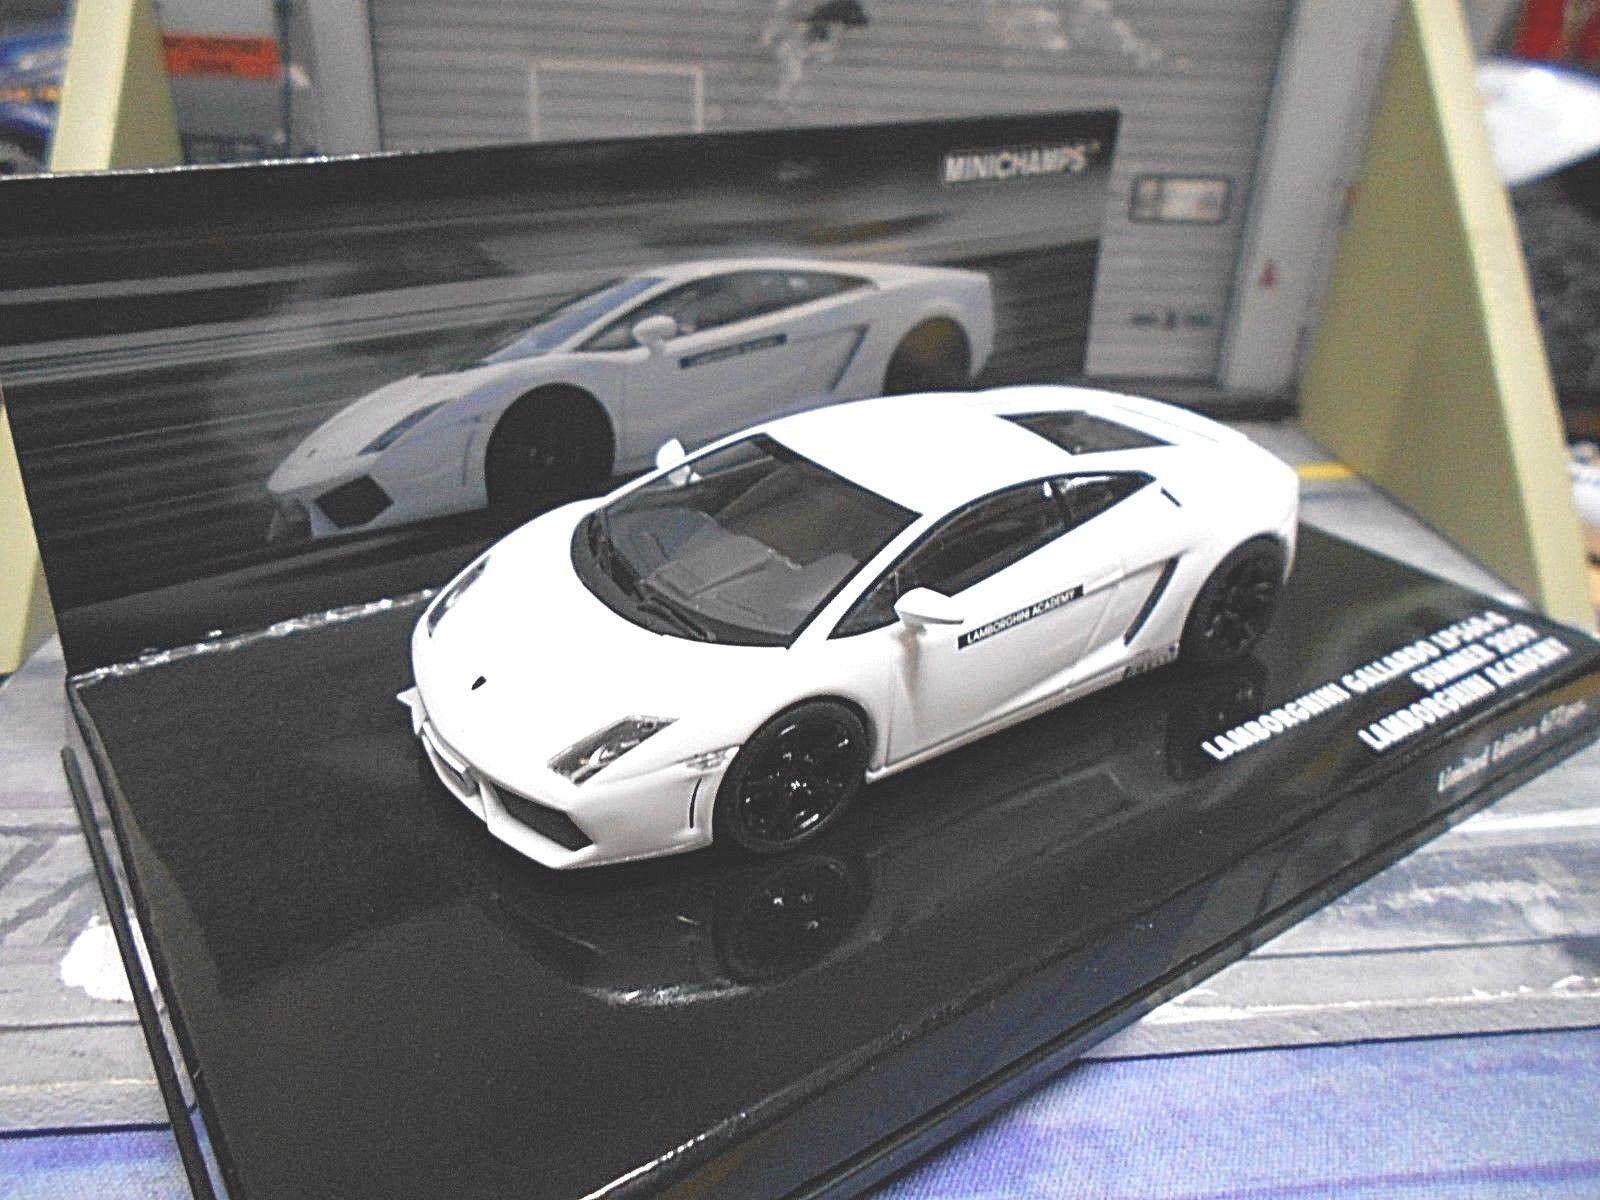 Lamborghini Gallardo lp560-4 Summer 2009 blanc weiss Academy Minichamps SP 1 43